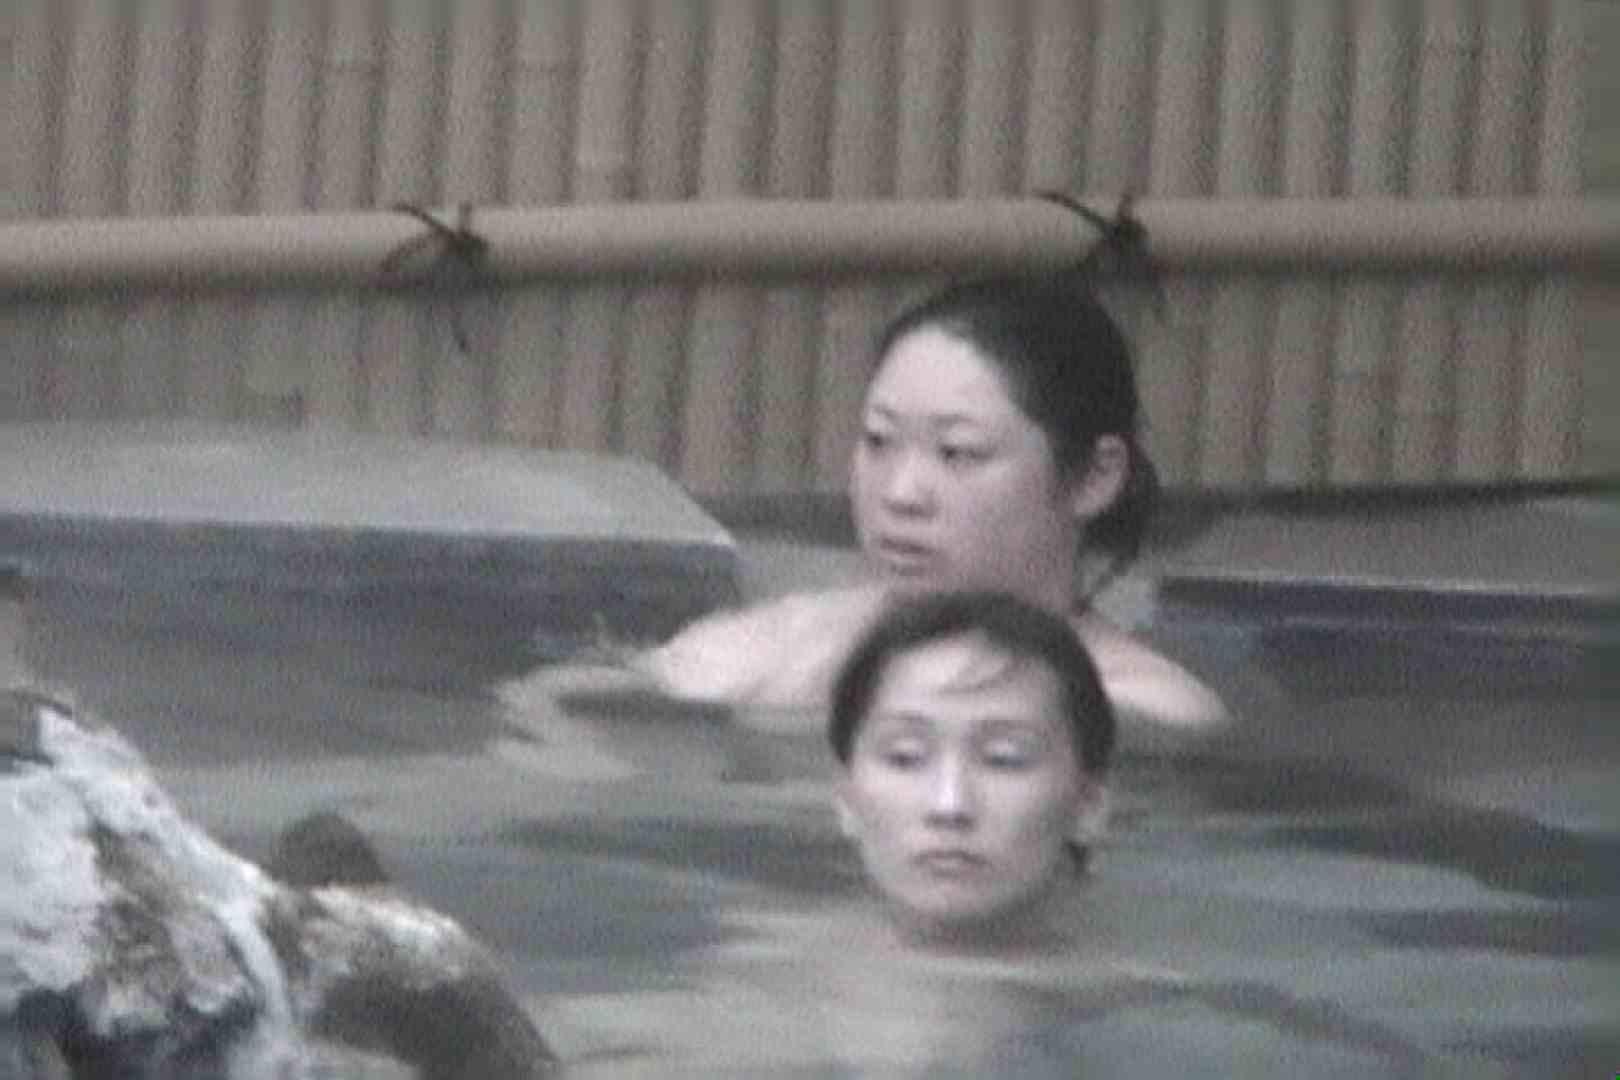 Aquaな露天風呂Vol.557 OLのエロ生活 | 露天風呂  34連発 10